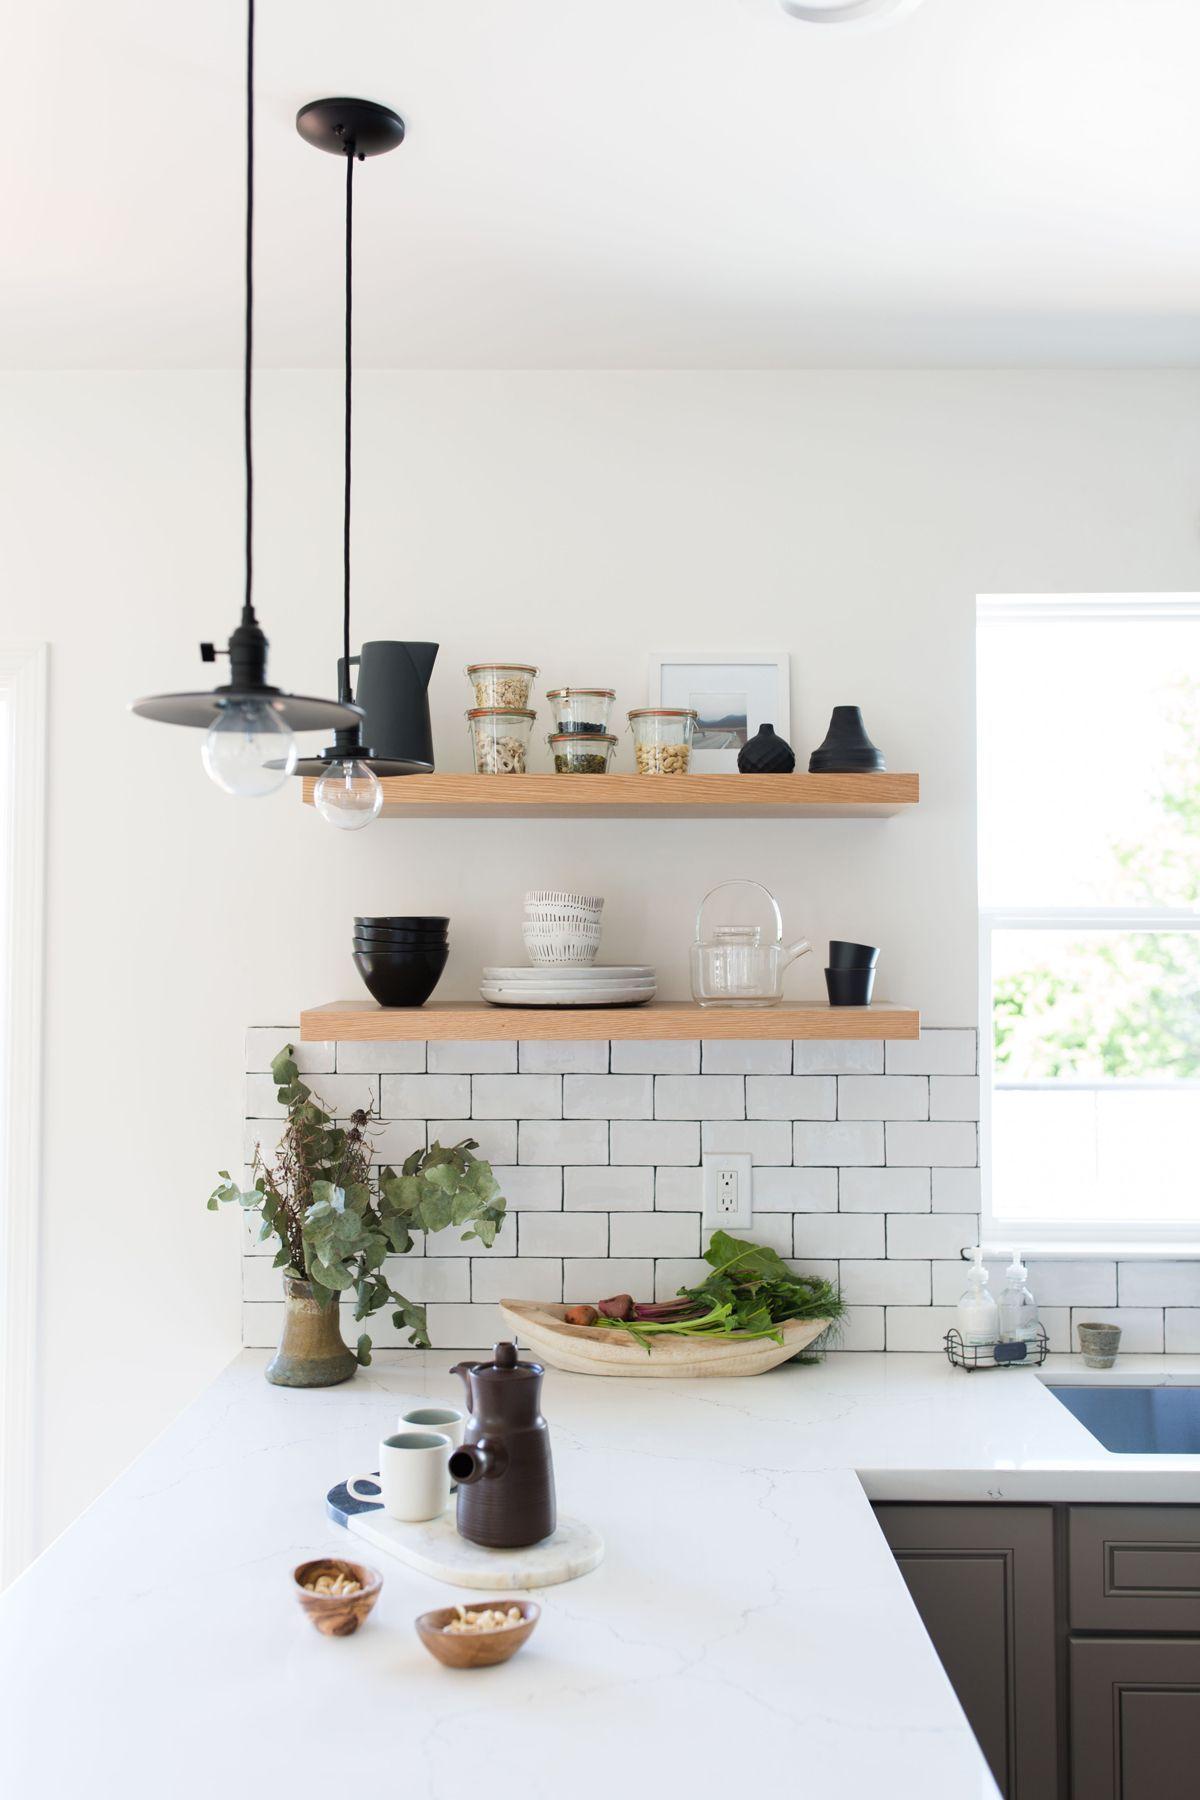 Kitchen design kitchen ideas modern kitchen open shelving